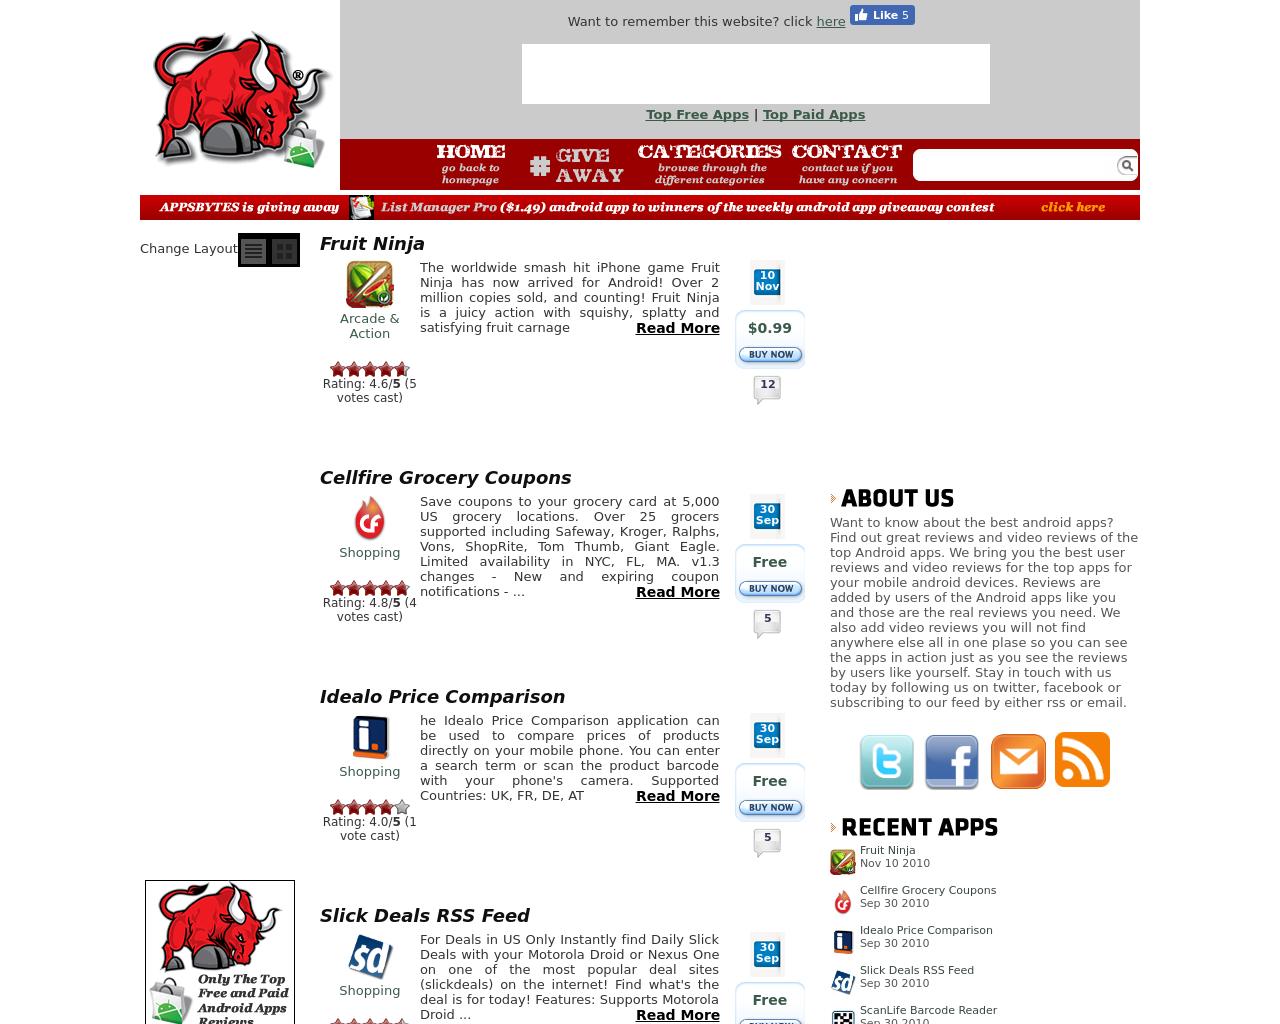 APPSBYTES-Advertising-Reviews-Pricing